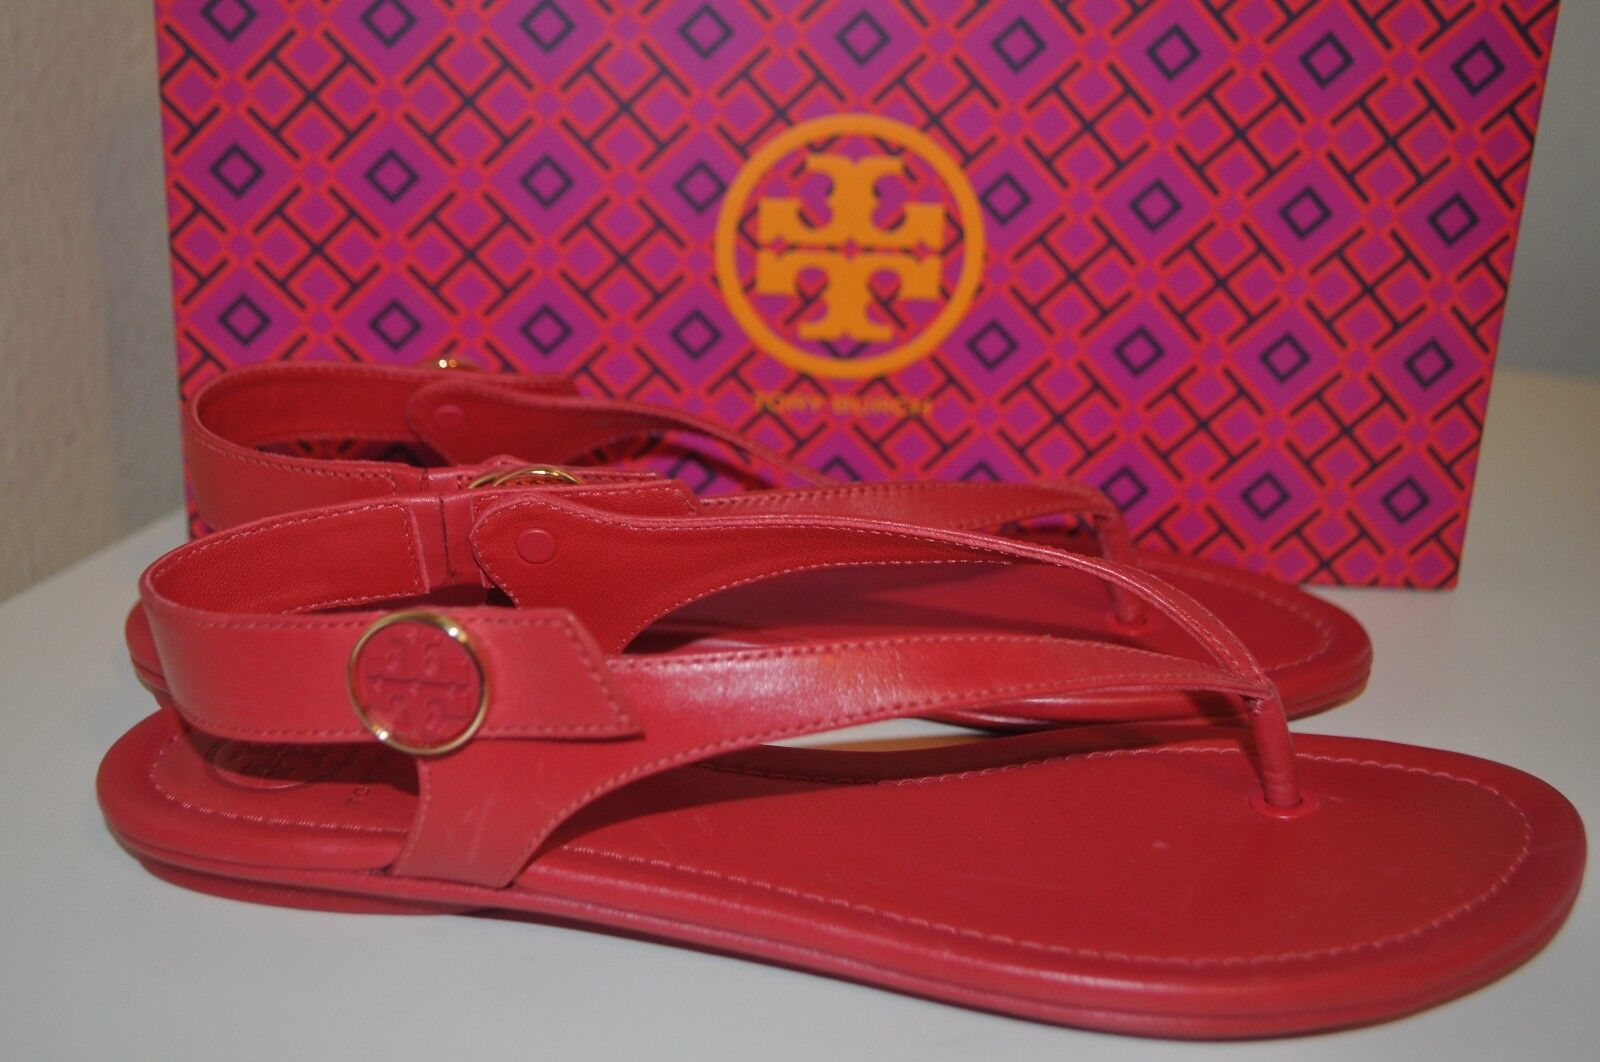 NIB  198+ Tory Burch MINNIE Travel Thong Sandal Nantucket RED Pelle Sz 7.5 M